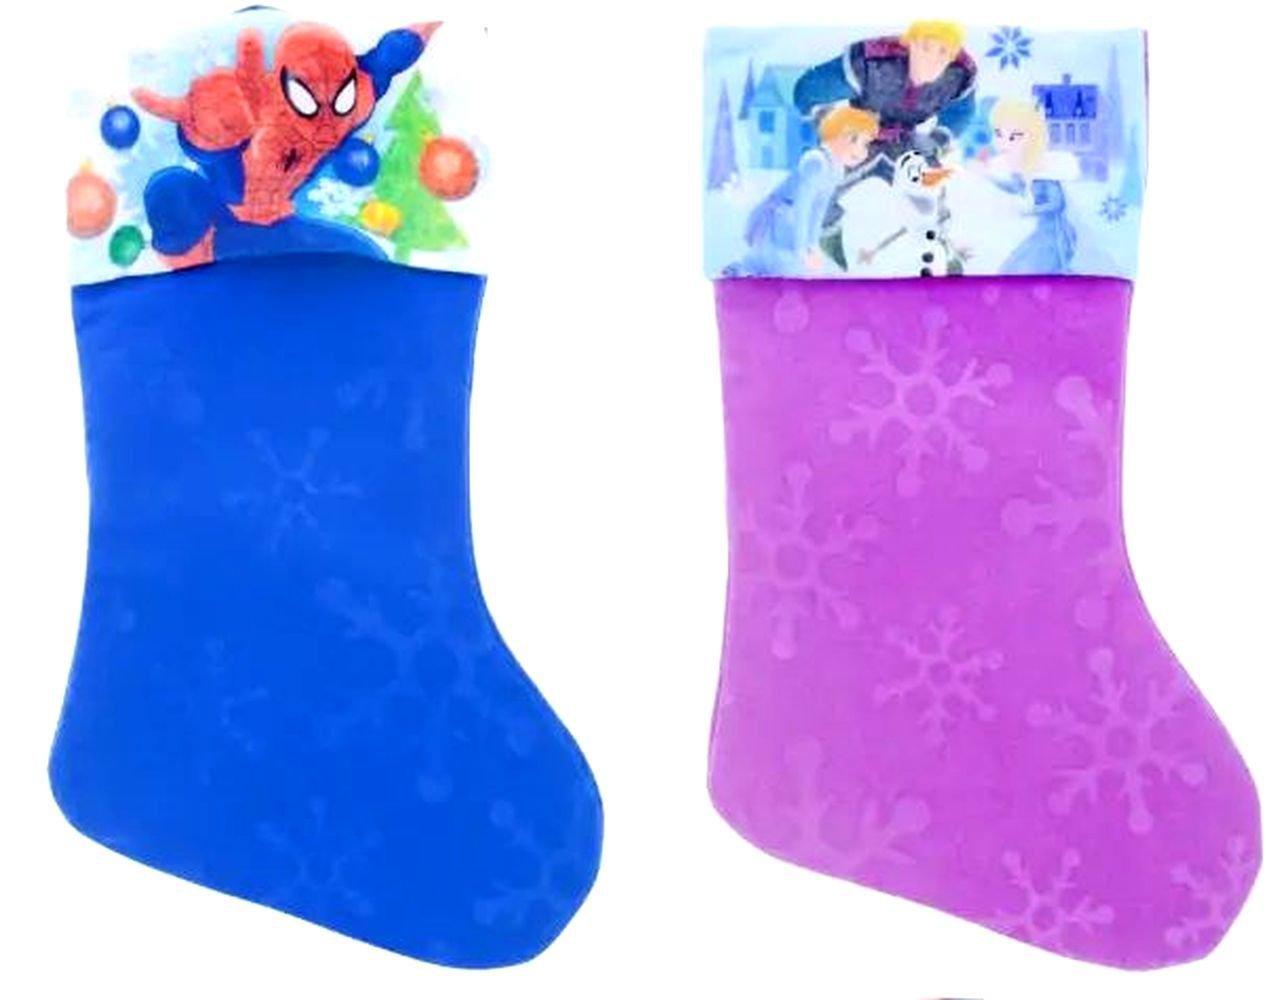 "Frozen - Spider-Man - 18"" Felt Christmas Stockings - (Set of 2)"